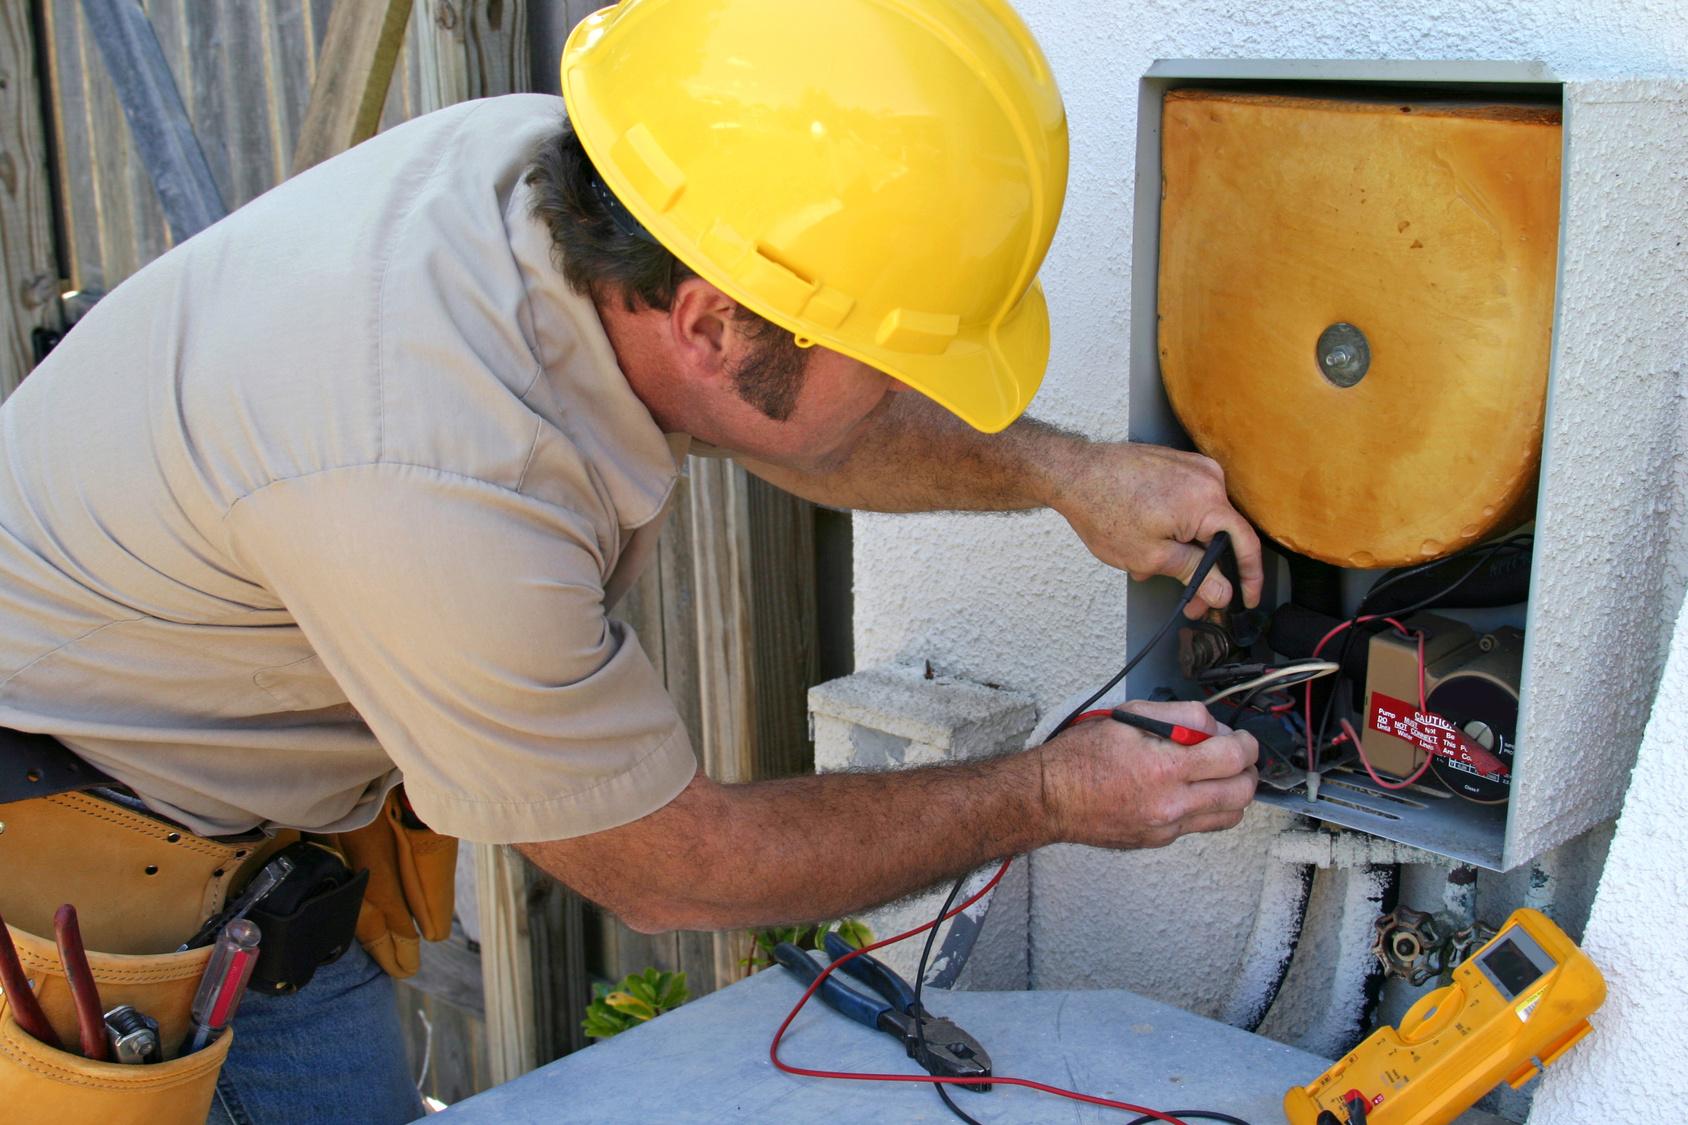 Technician fixing appliance